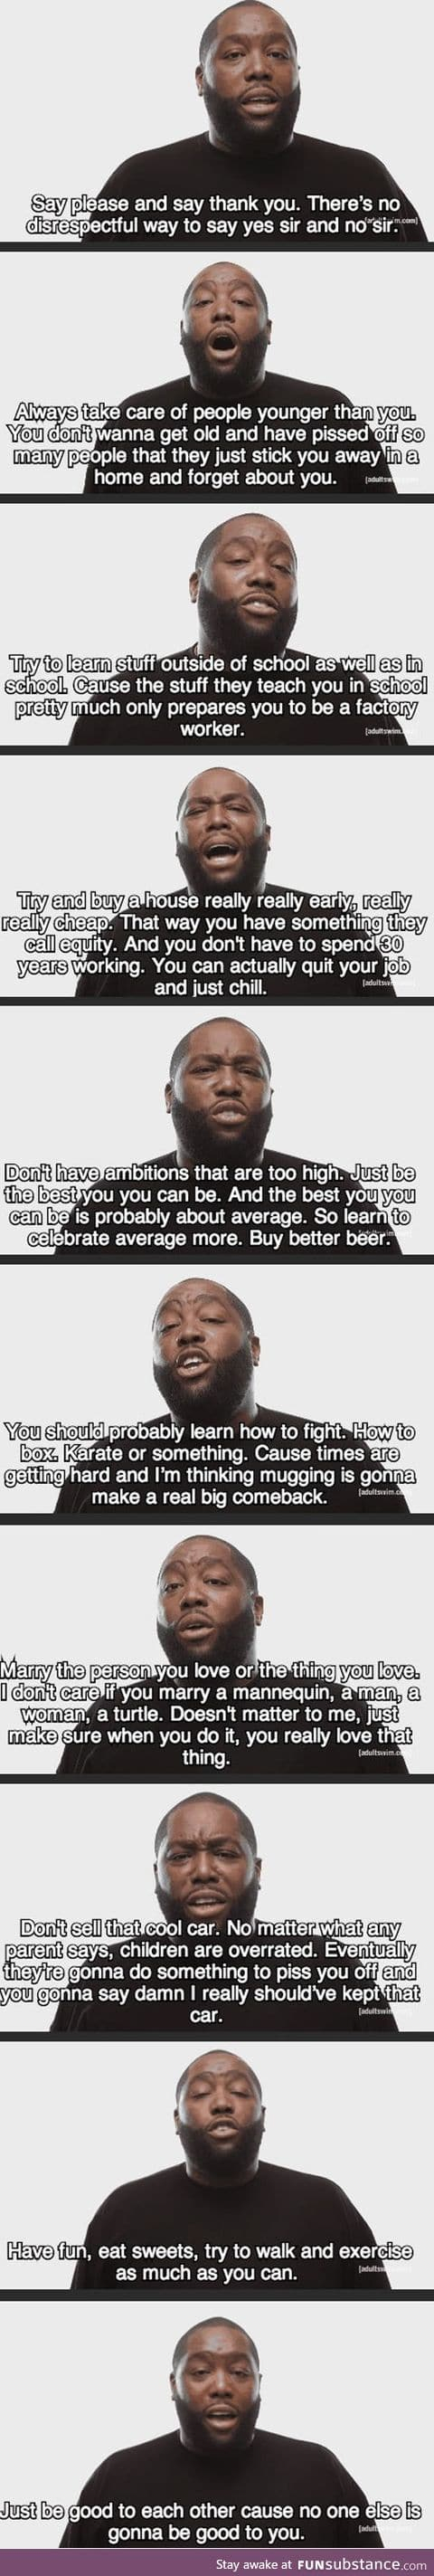 List of life advice